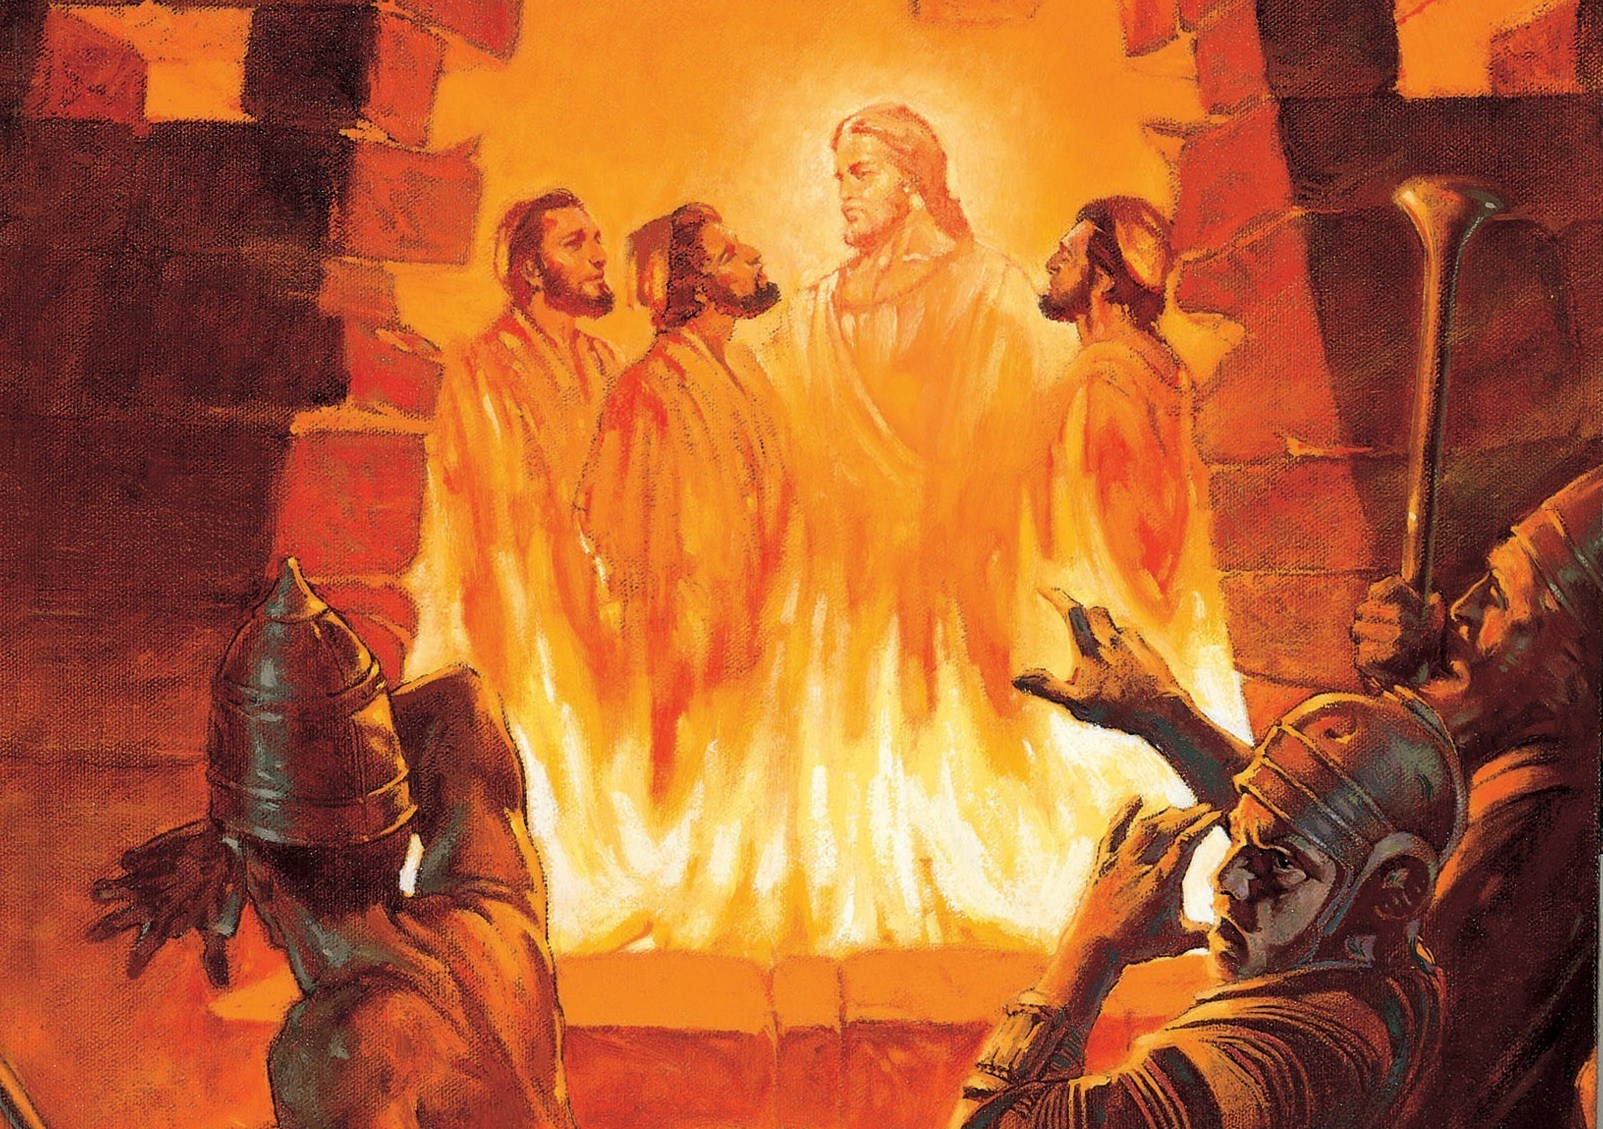 three men in the fiery furnace william maughan 1985 Taanieli raamatu õppimine